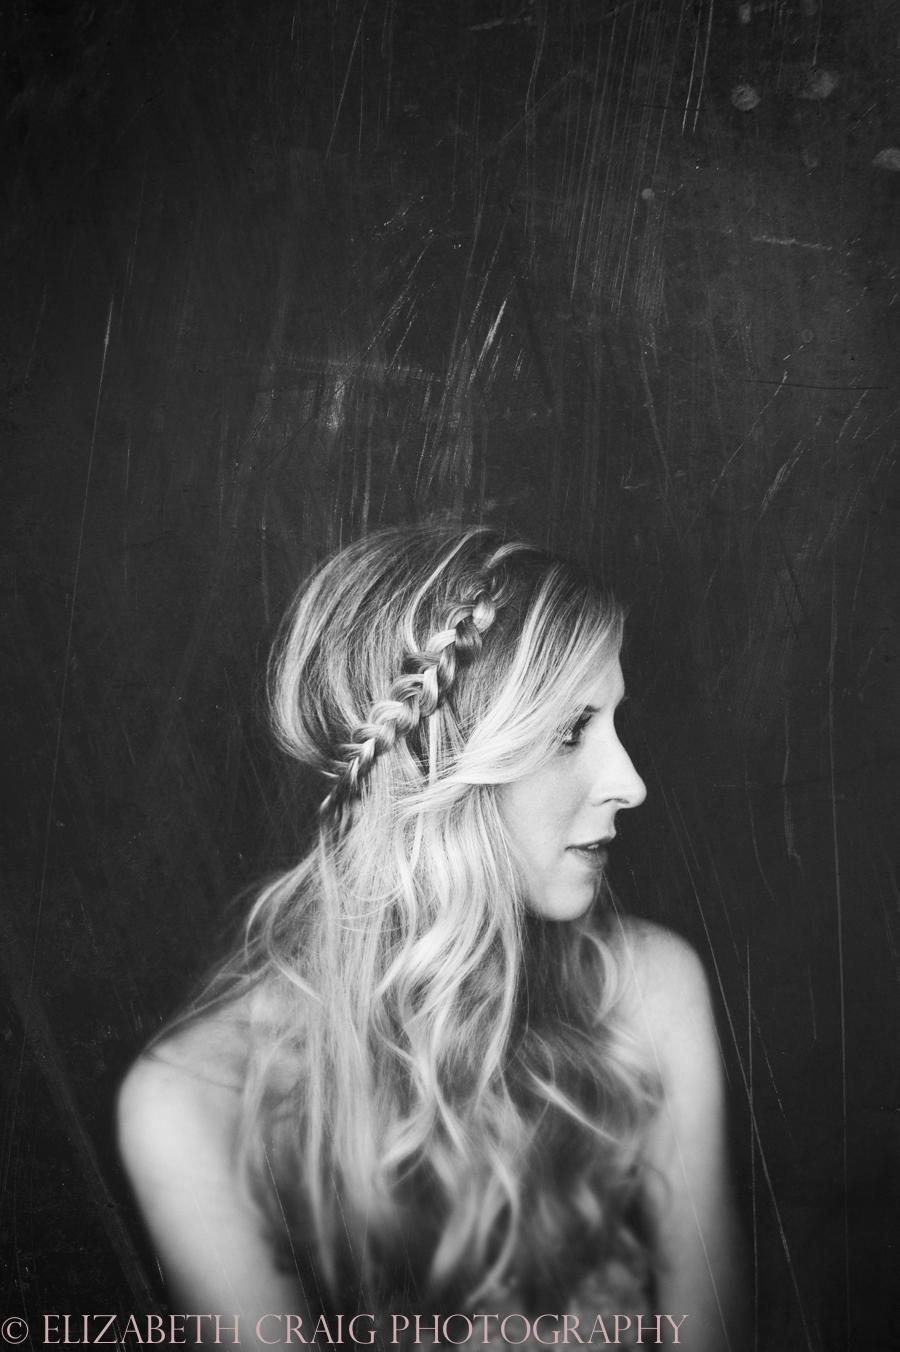 Pittsburgh Portrait Photographer | Boudoir Photographer | Beauty Photographer | Elizabeth Craig Photography Intimates-0008